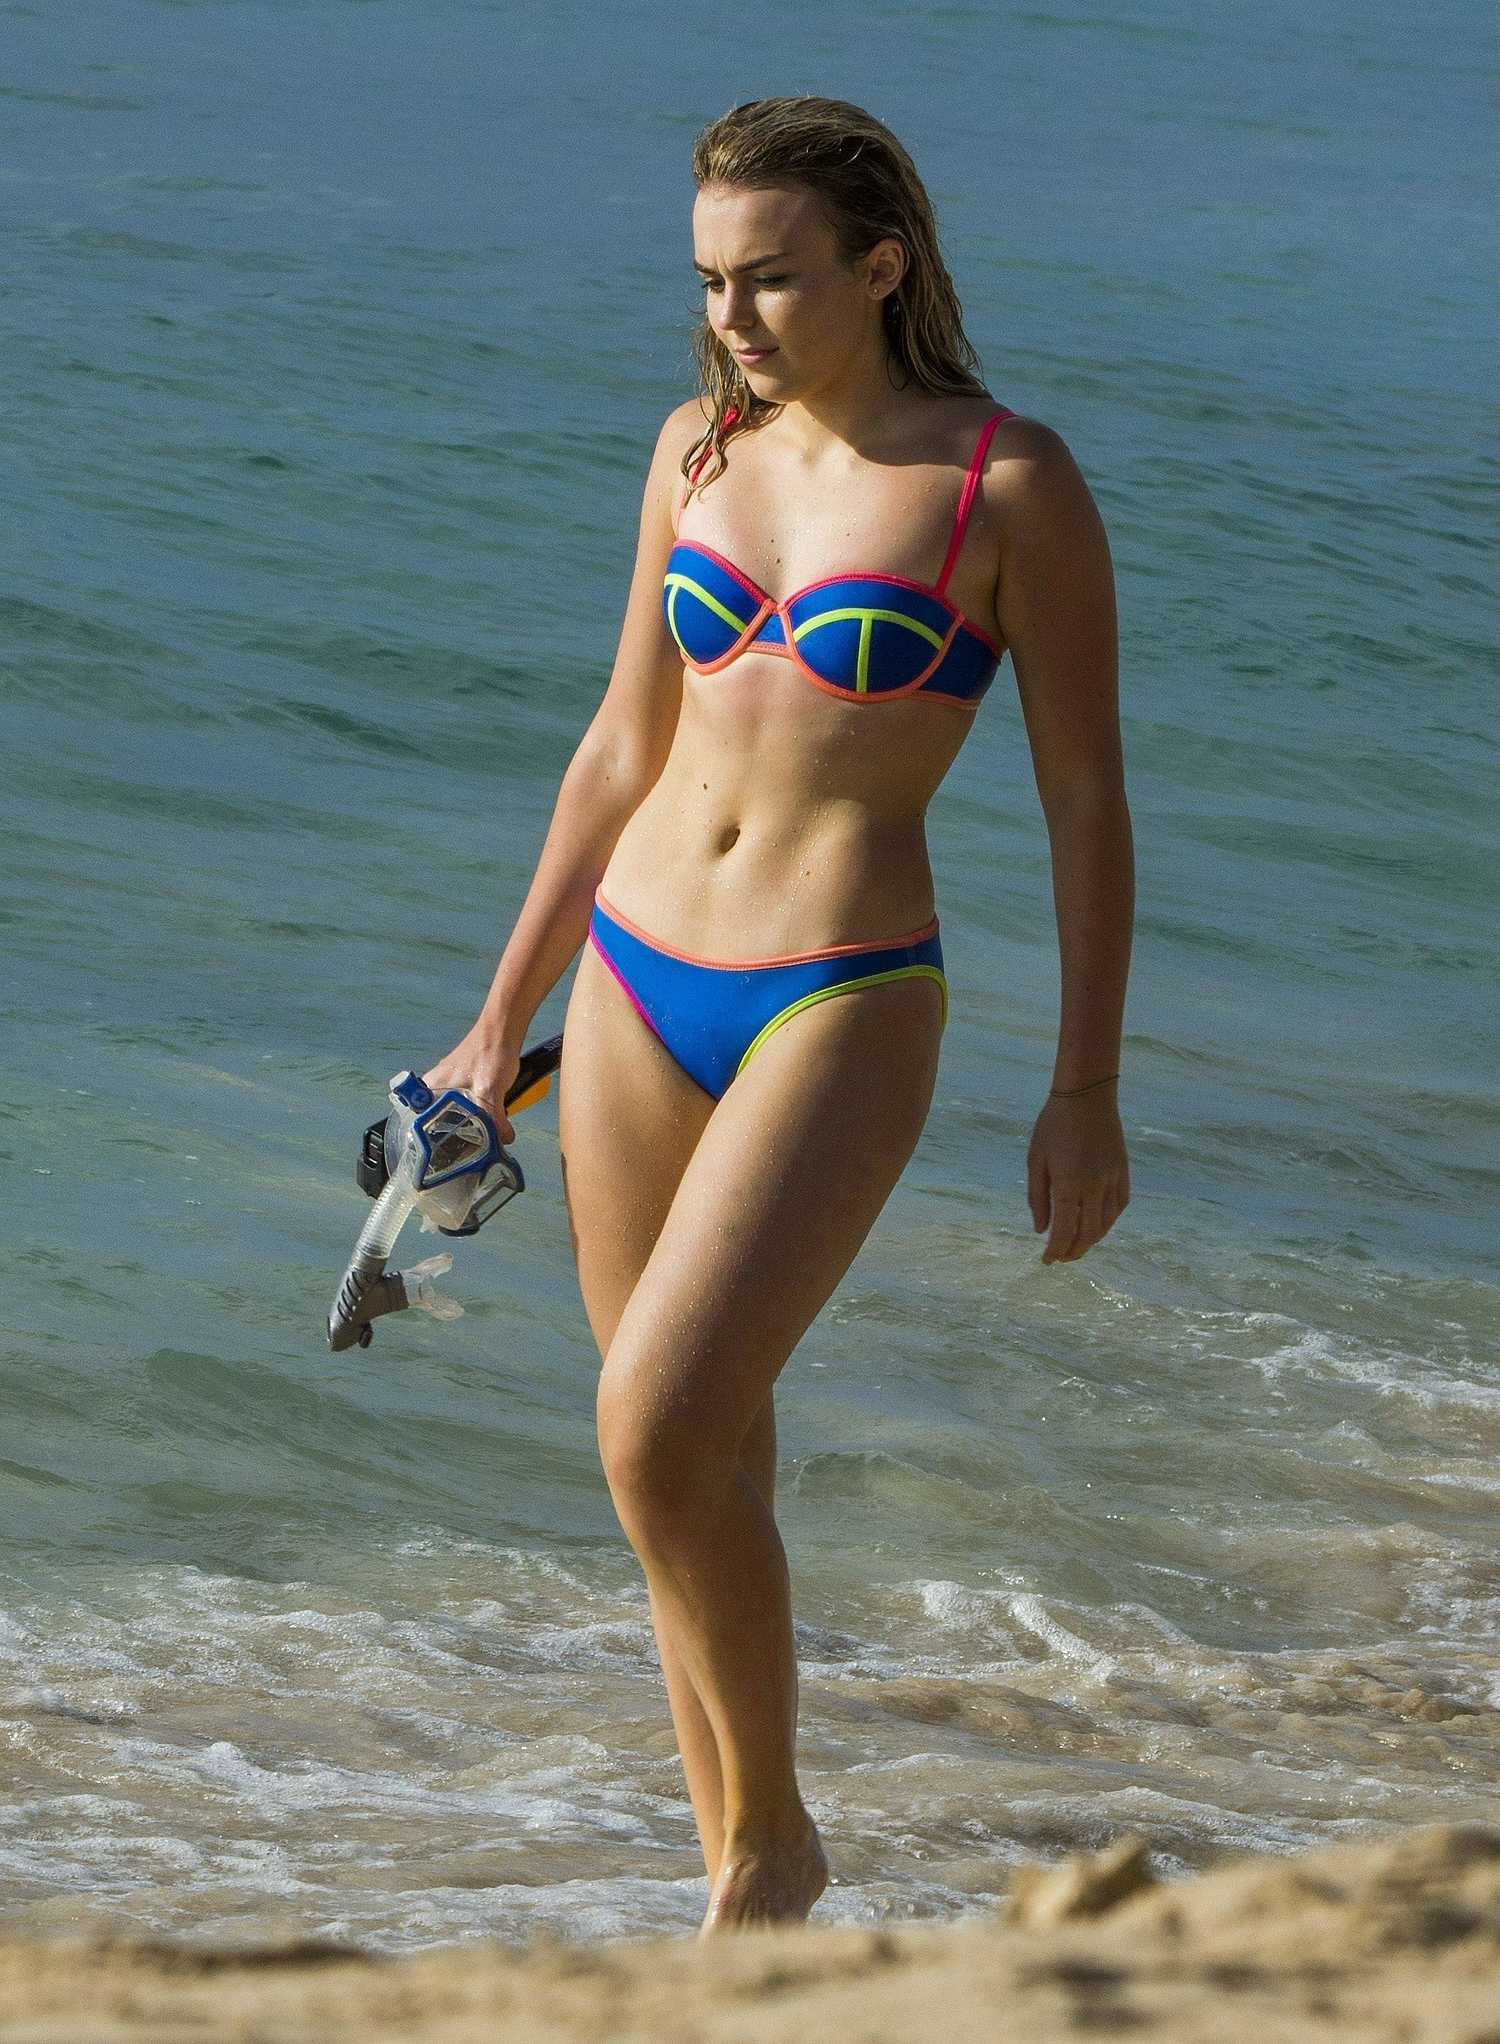 de433d1c1b Tallia Storm in a Blue Bikini at the Beach in Barbados – Celeb Donut